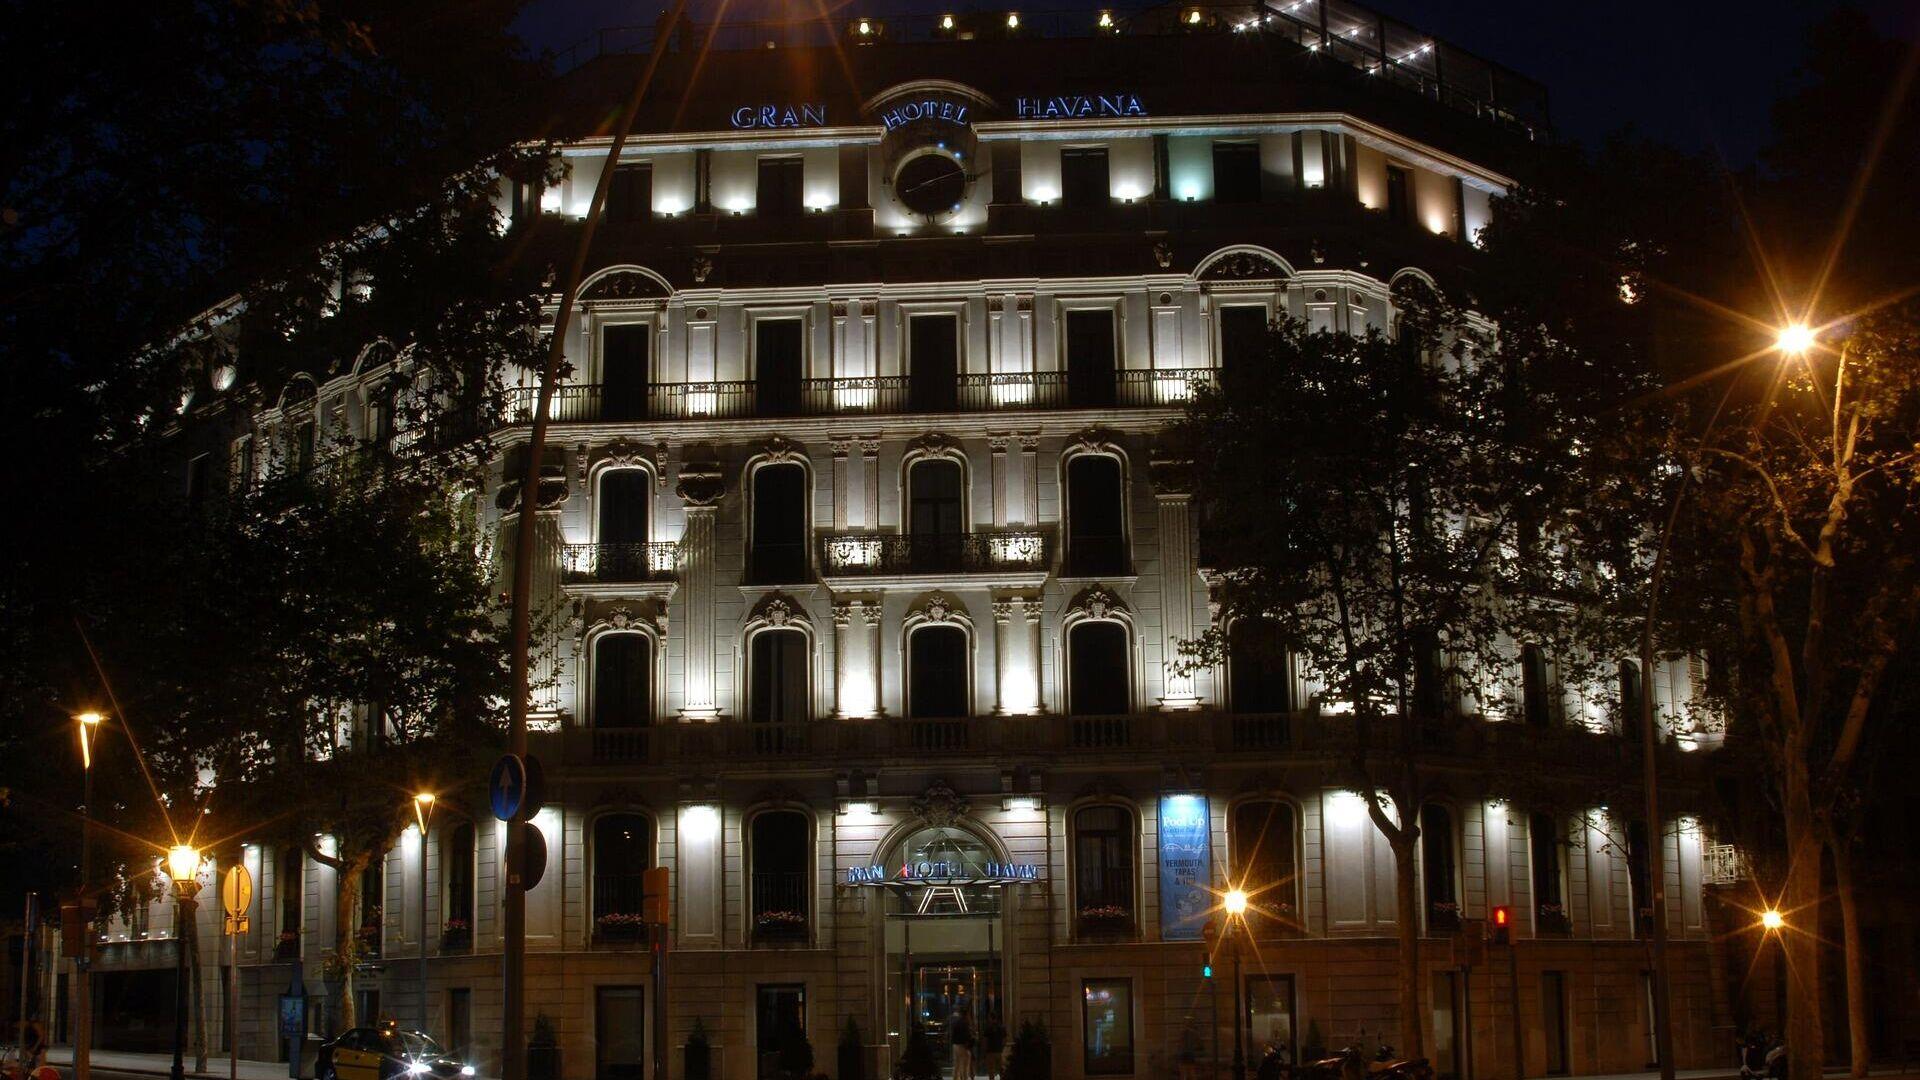 Vista nocturna sobre hotel en Barcelona - Sputnik Mundo, 1920, 17.08.2021